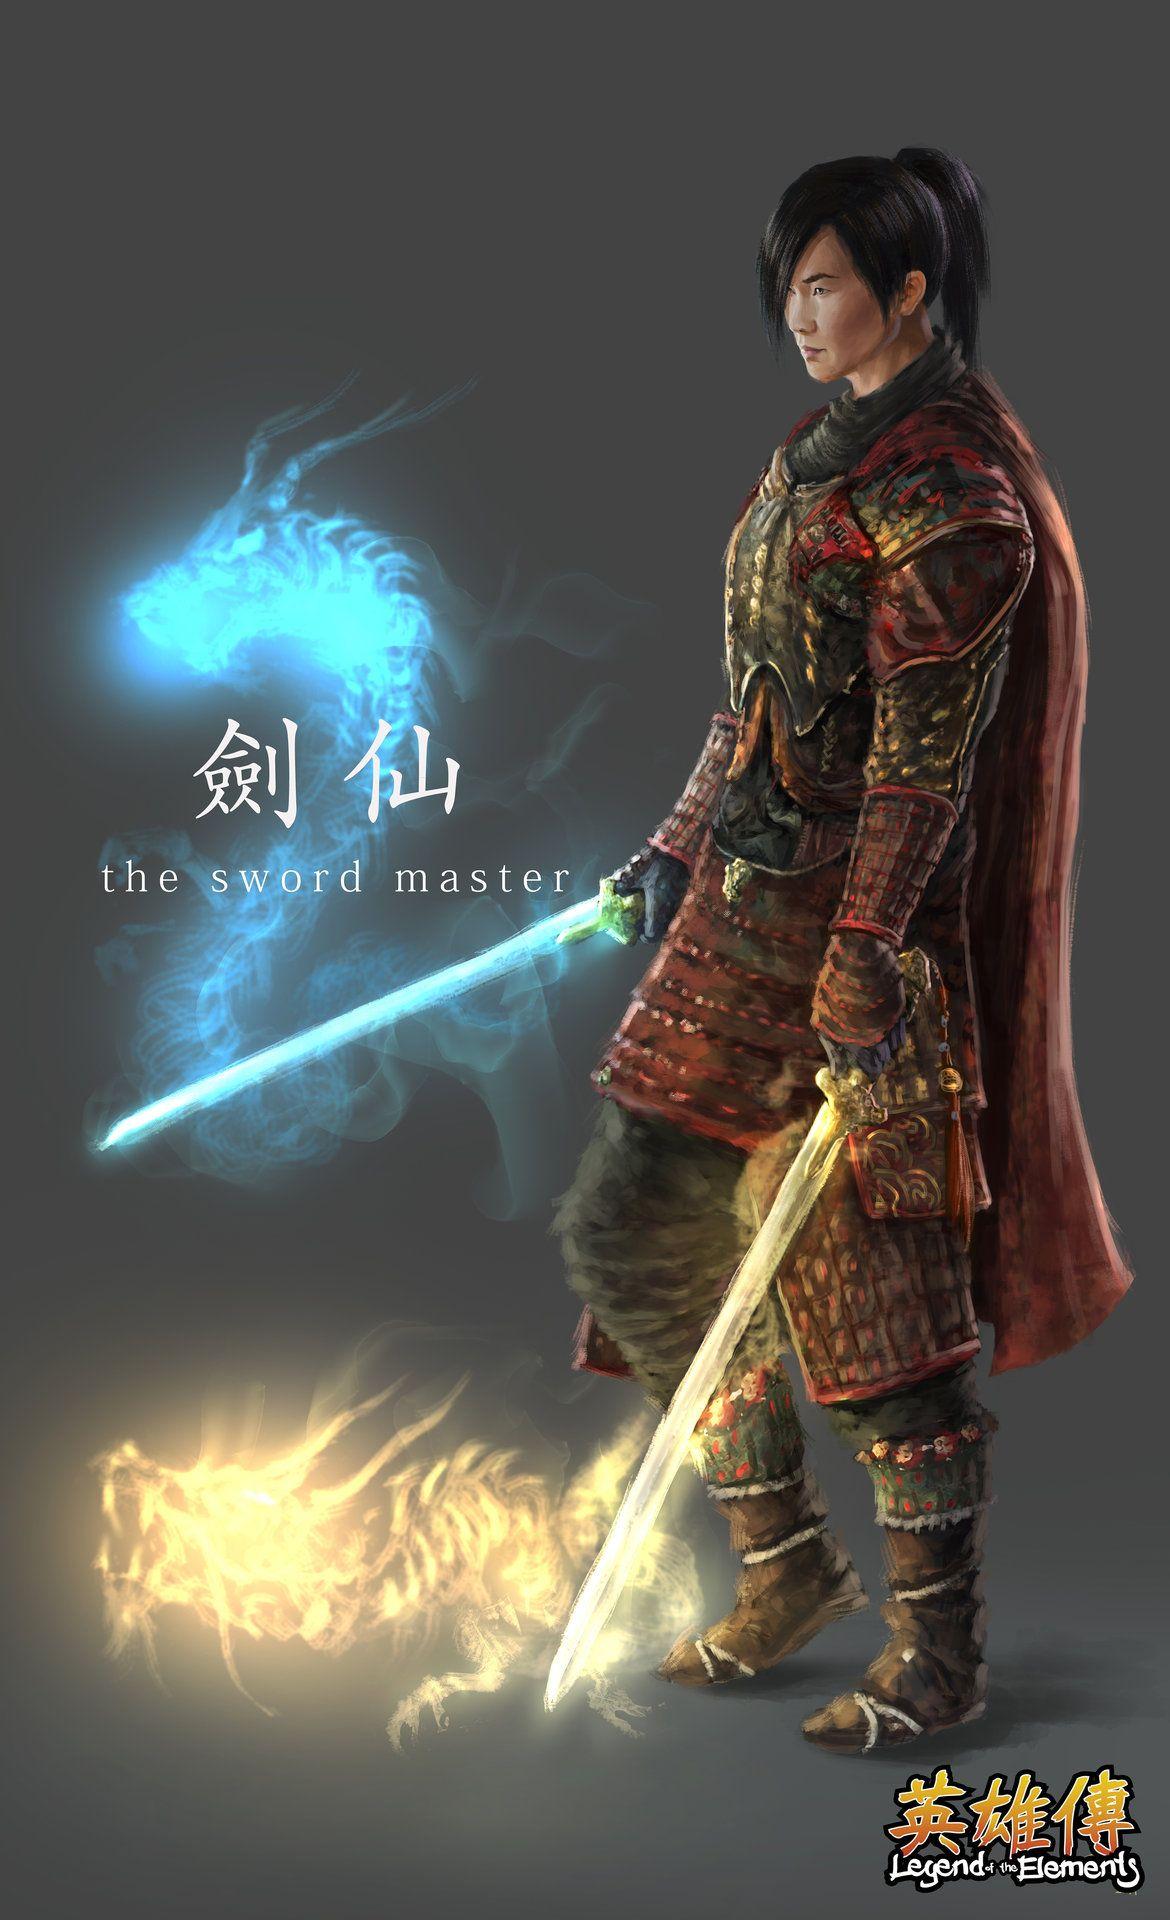 ArtStation - The Sword Master (Legend of the Elements), Sam Leung